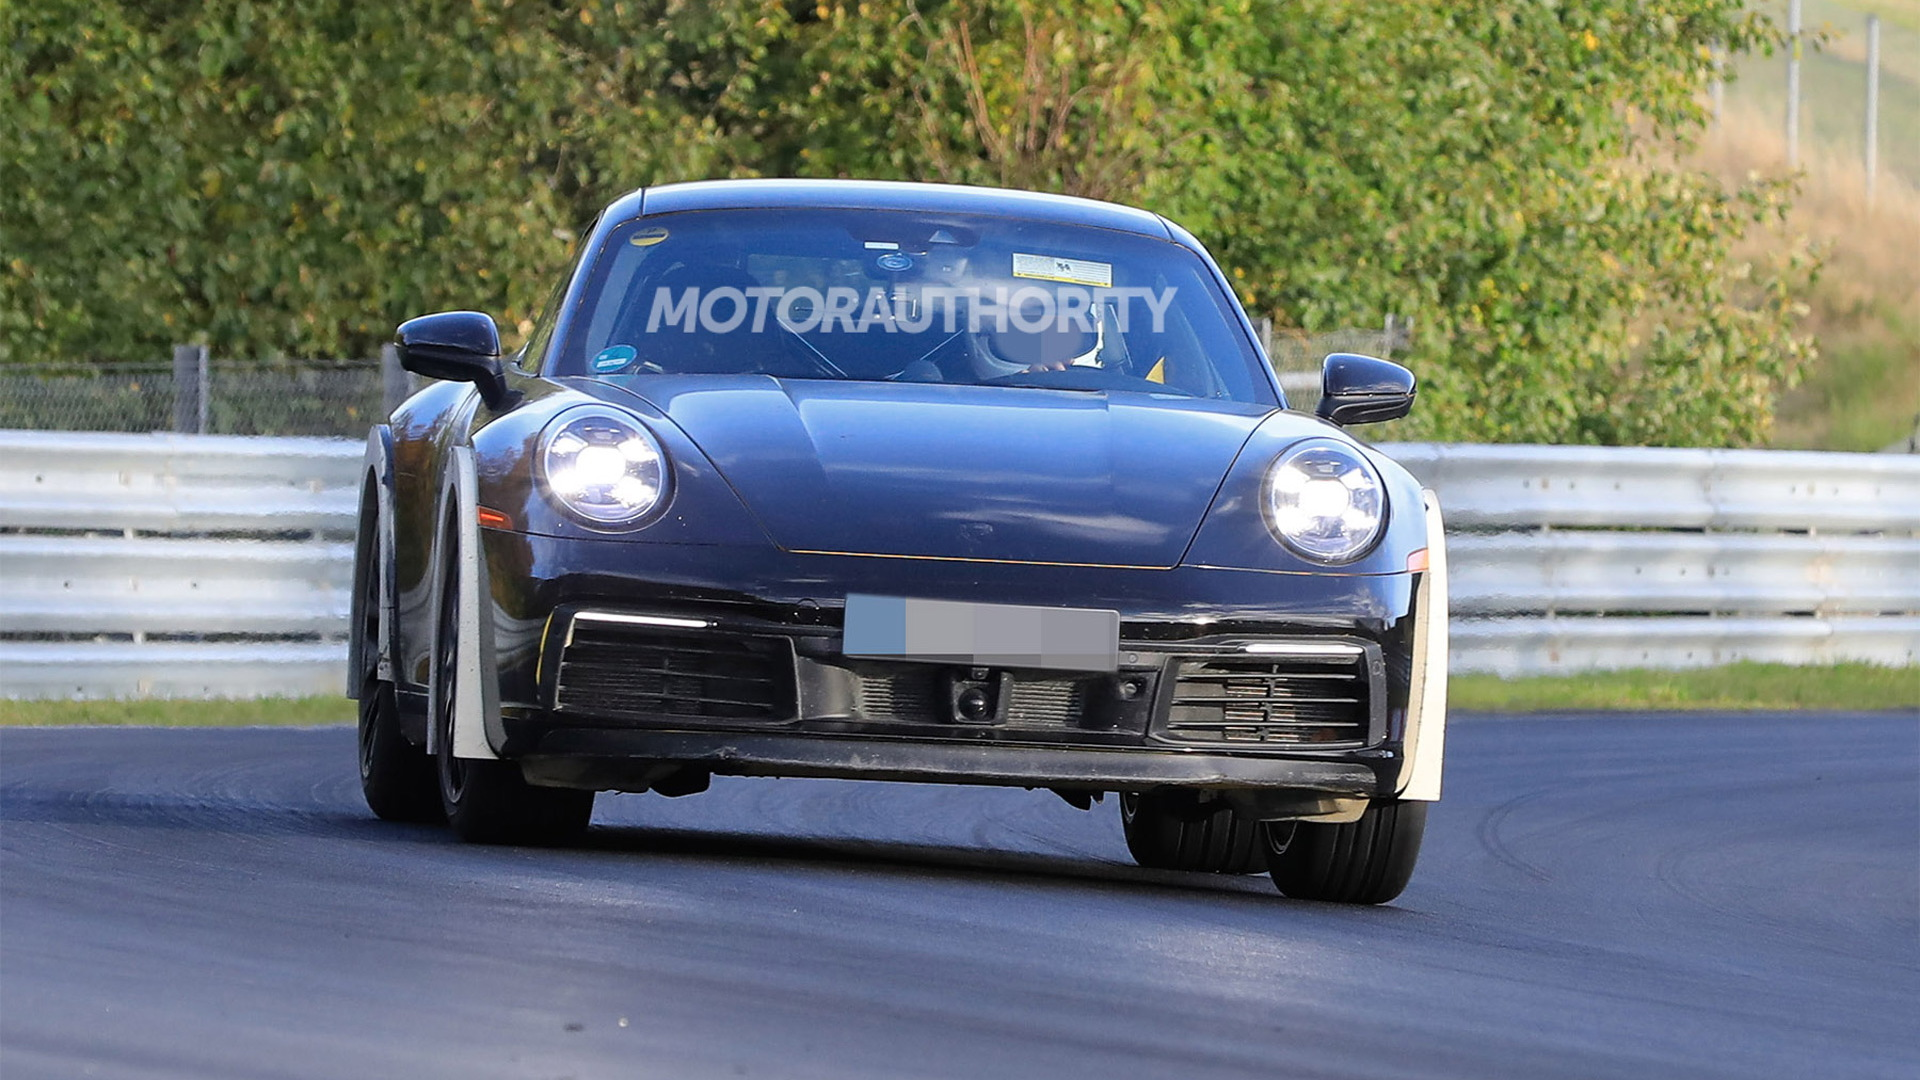 High-riding Porsche 911 prototype spy shots - Photo credit:S. Baldauf/SB-Medien